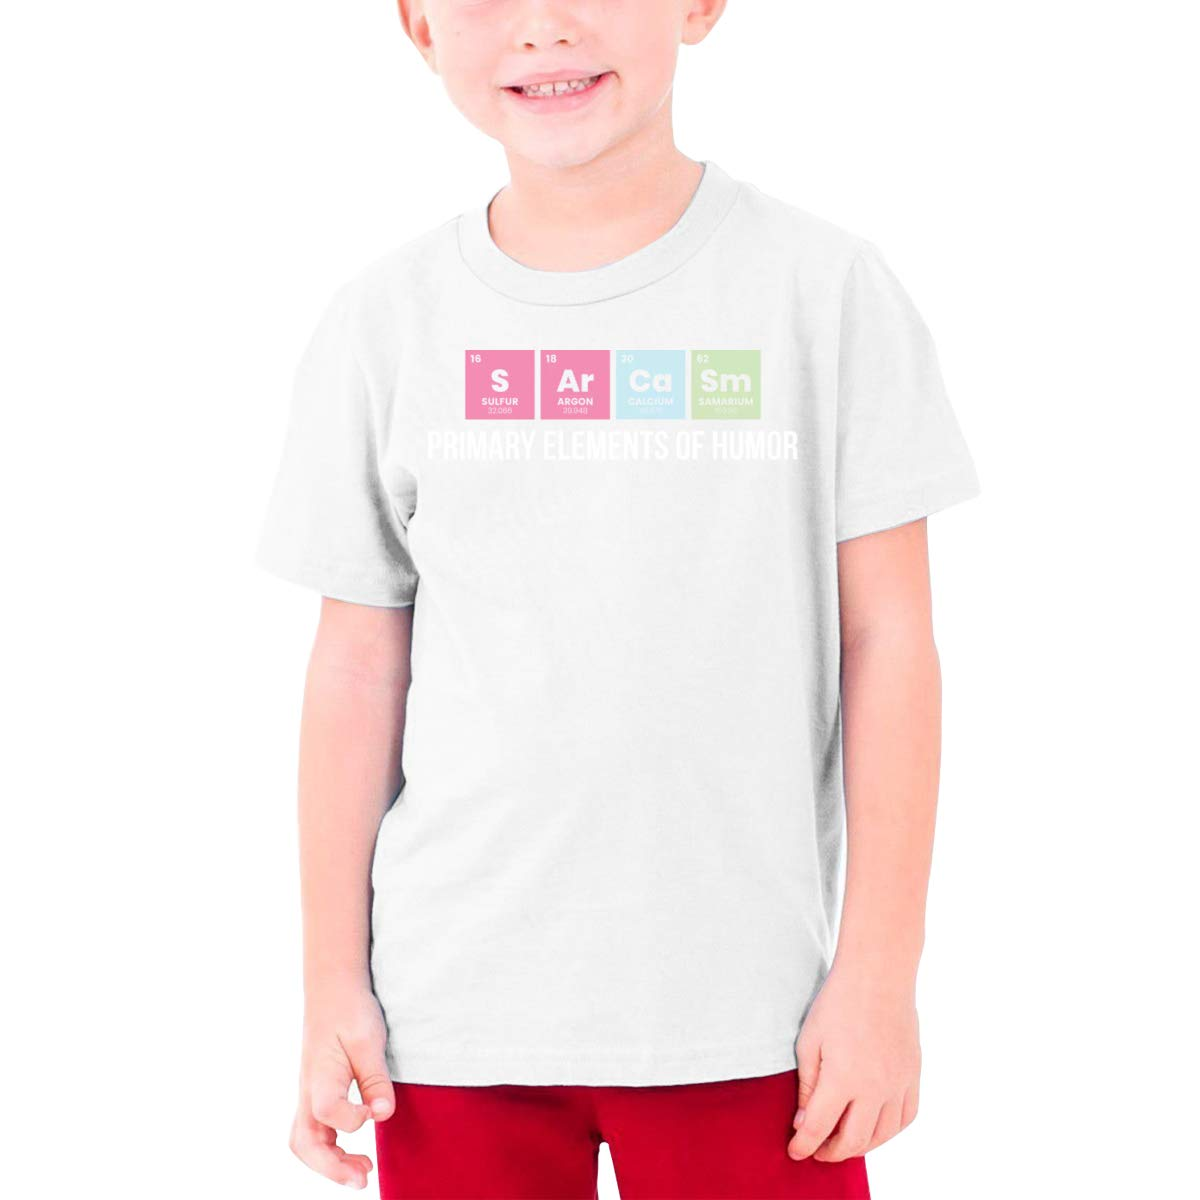 Primary Elements of Humor Boys Short Sleeve Tee